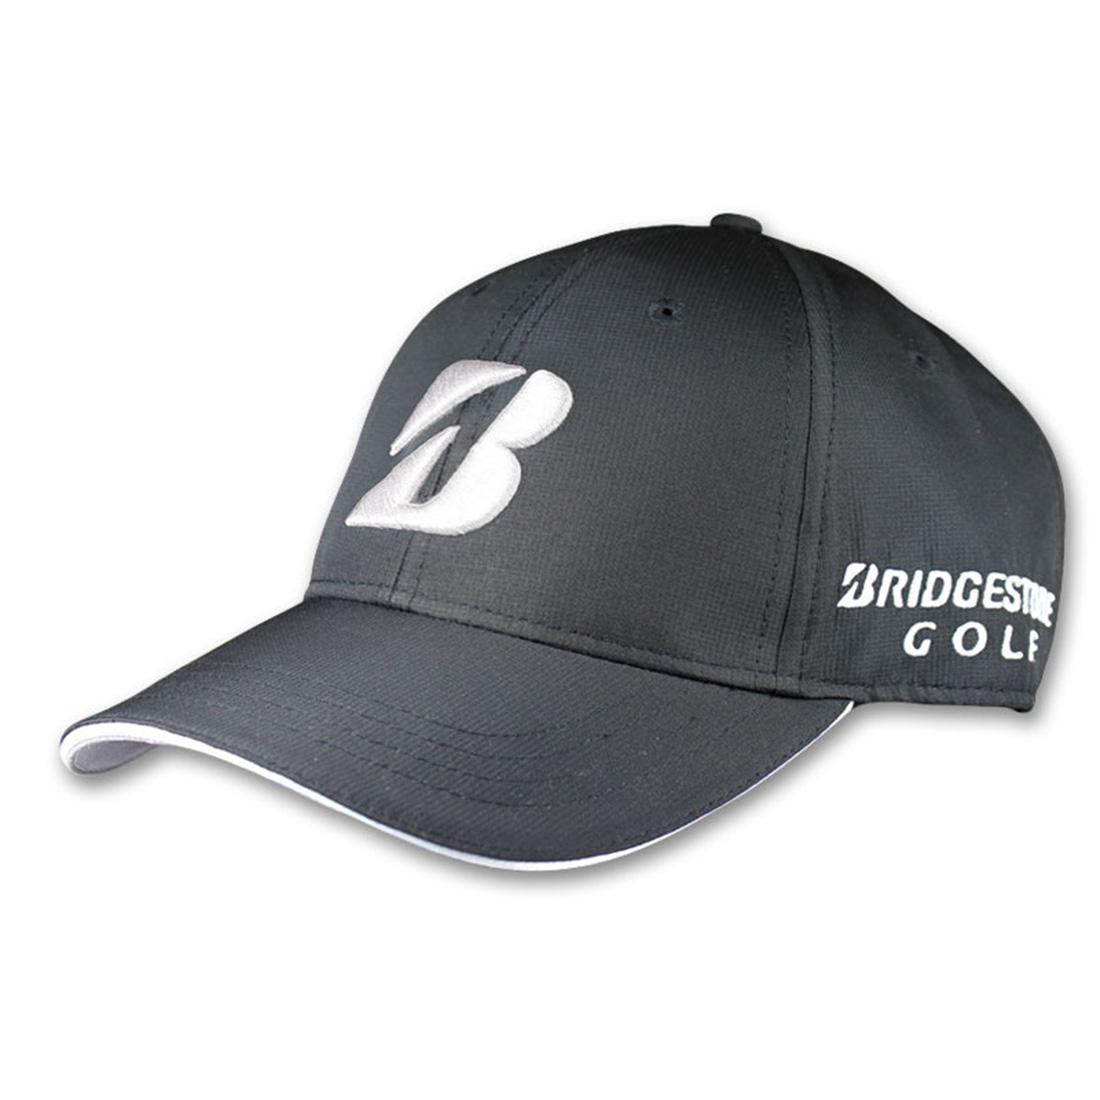 8c361ef2632b2 Bridgestone Golf Contrast Stitch Performance Cap - Black